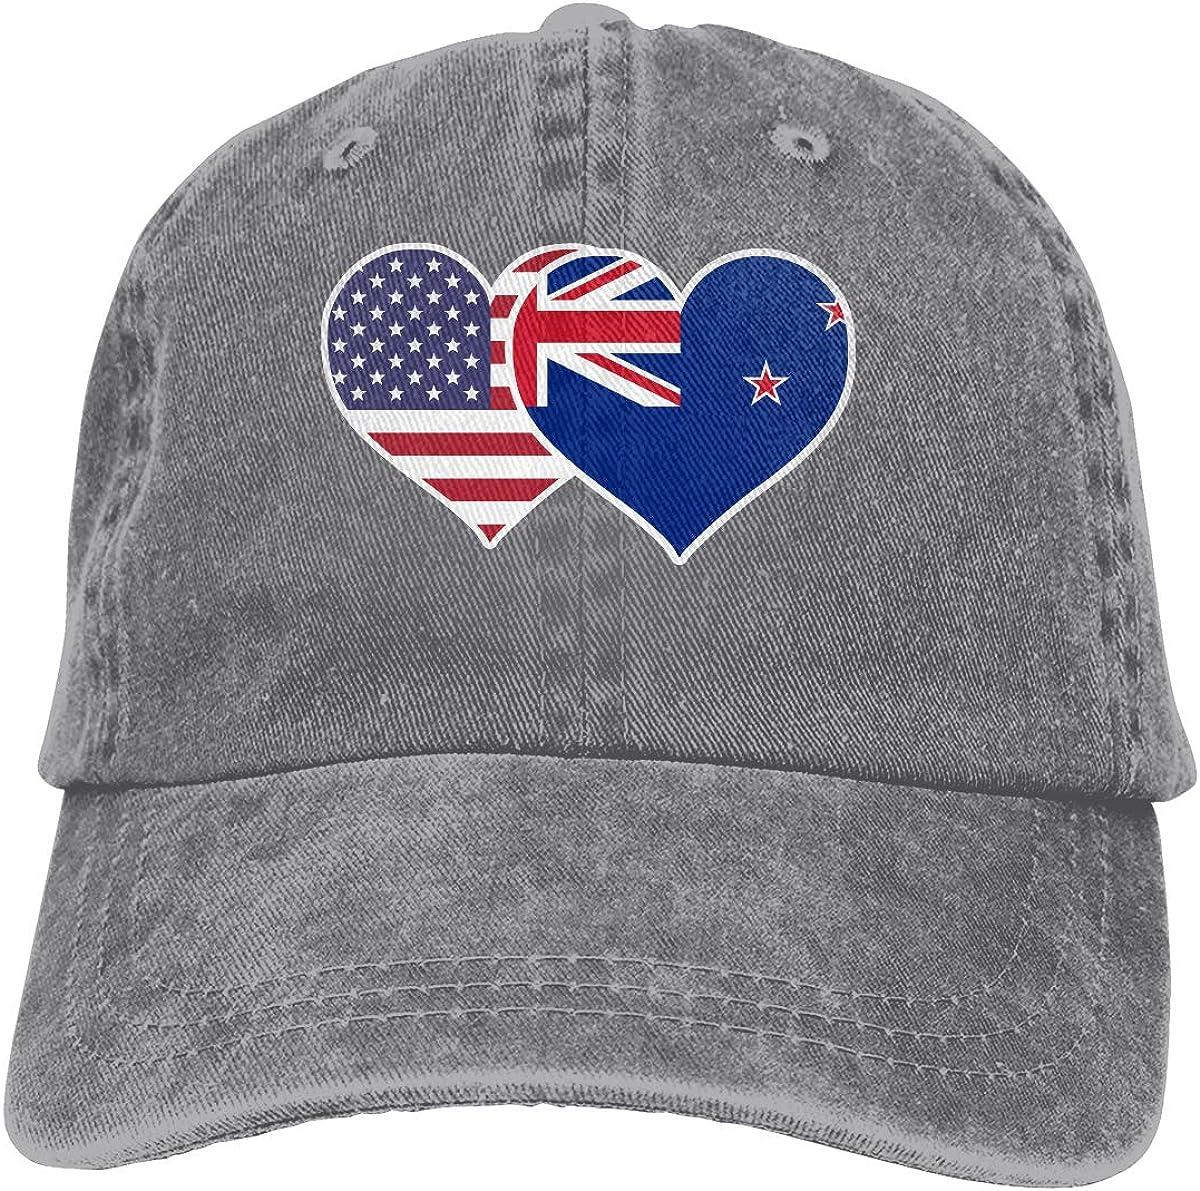 American New Zealand Flag Heart Adult Custom Cowboy Sun Hat Adjustable Baseball Cap